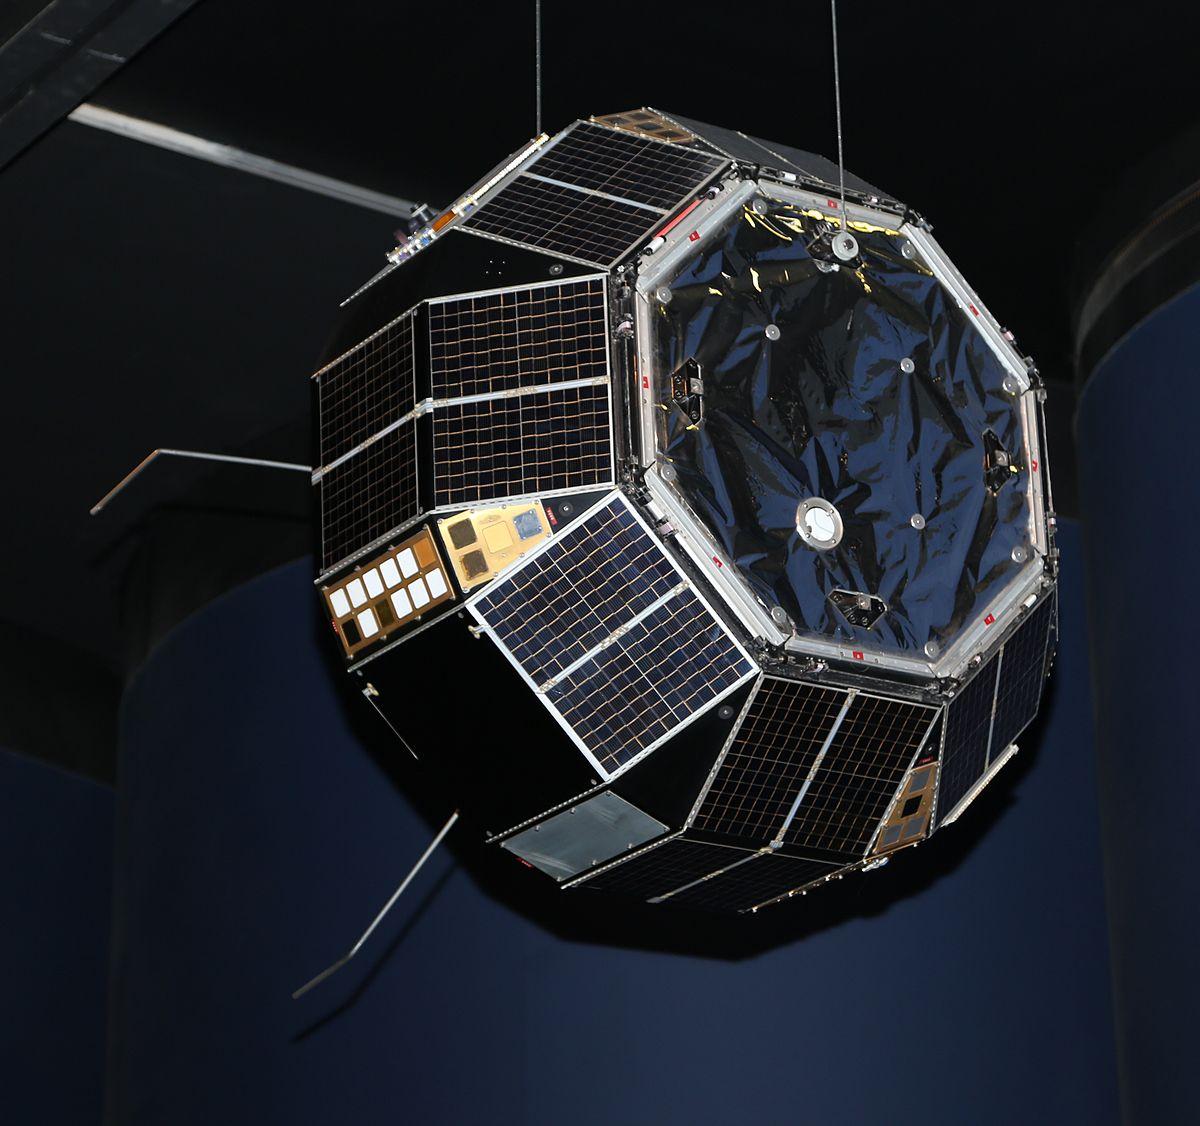 Prospero Satellite Wikipedia - Satelite image